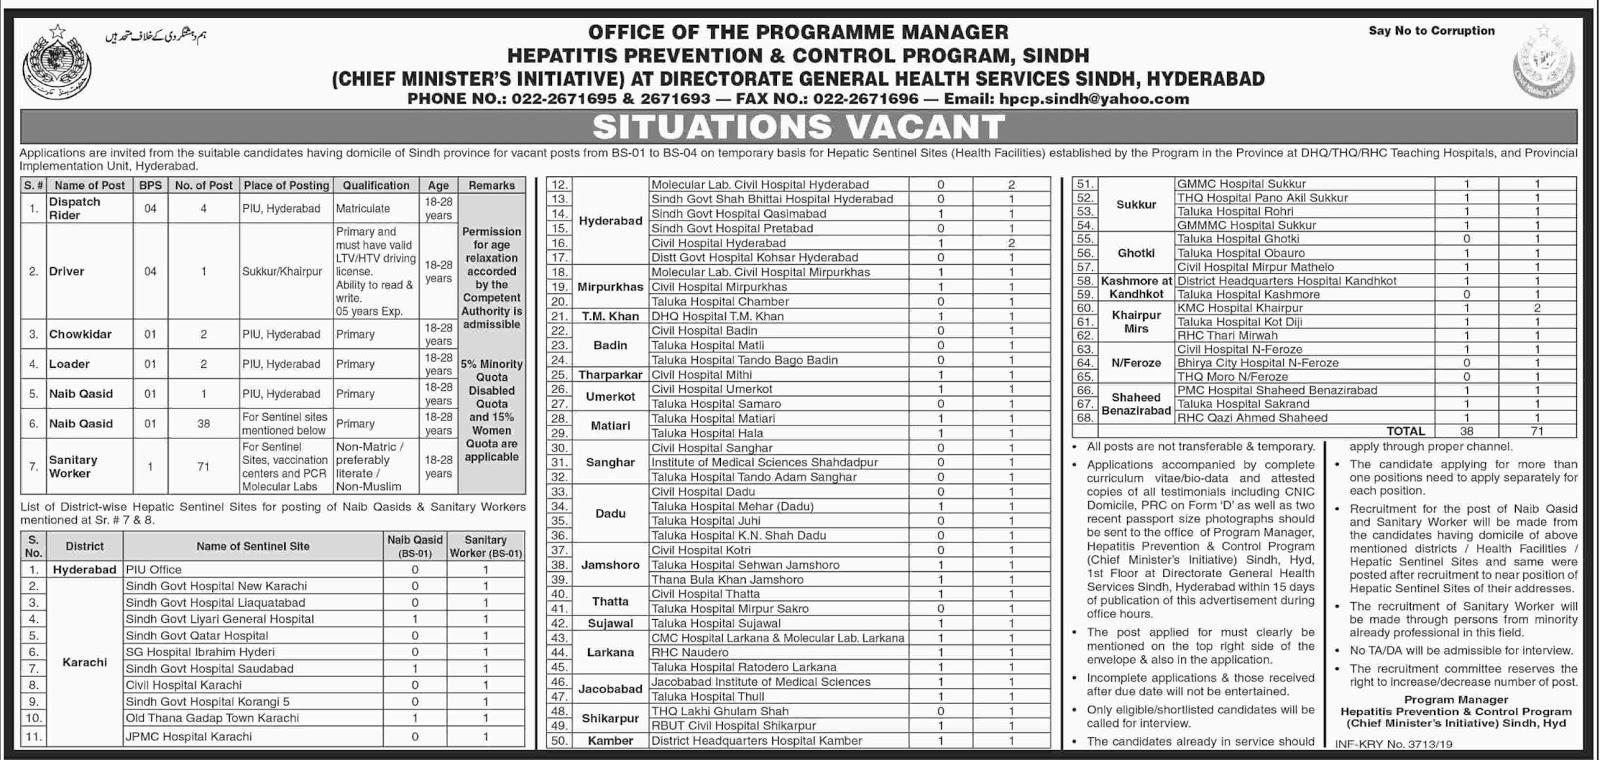 150+ Jobs in Hepatitis Prevention & Control Program Sindh 11 July 2019